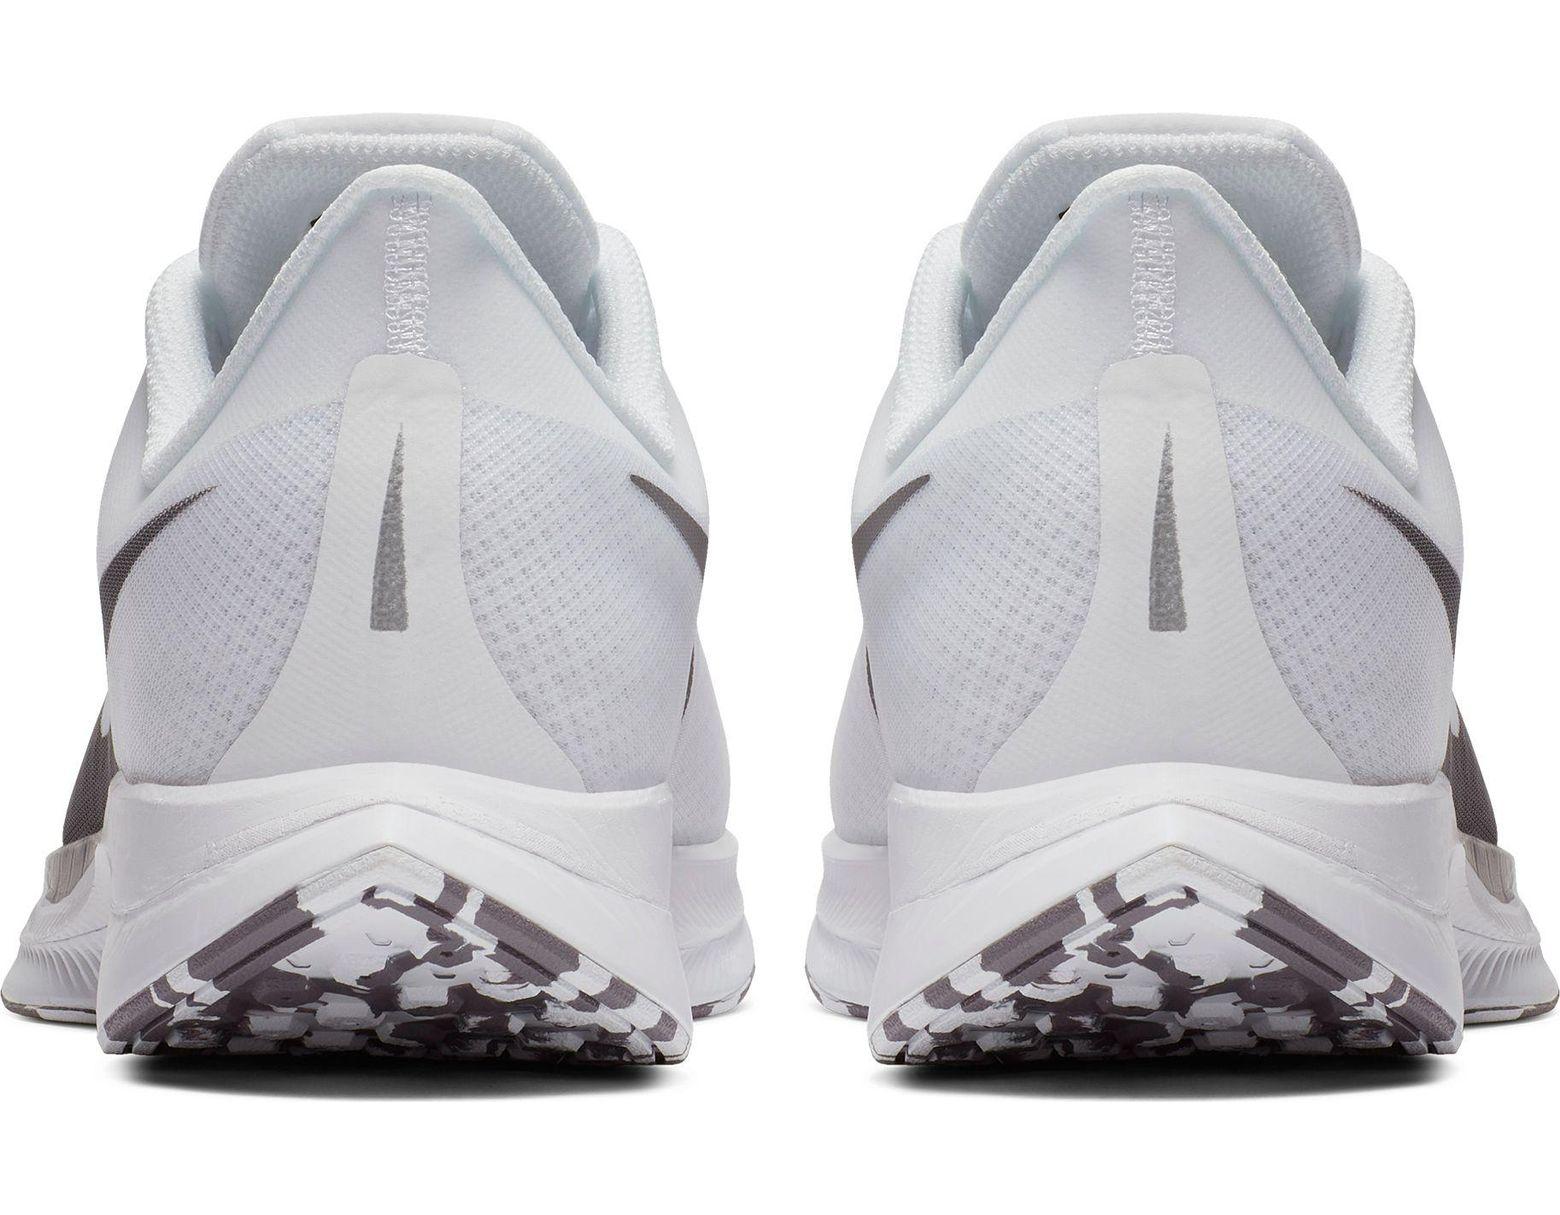 c44b4aaa2433 Lyst - Nike Air Zoom Pegasus 35 Turbo Running Shoes in Gray for Men